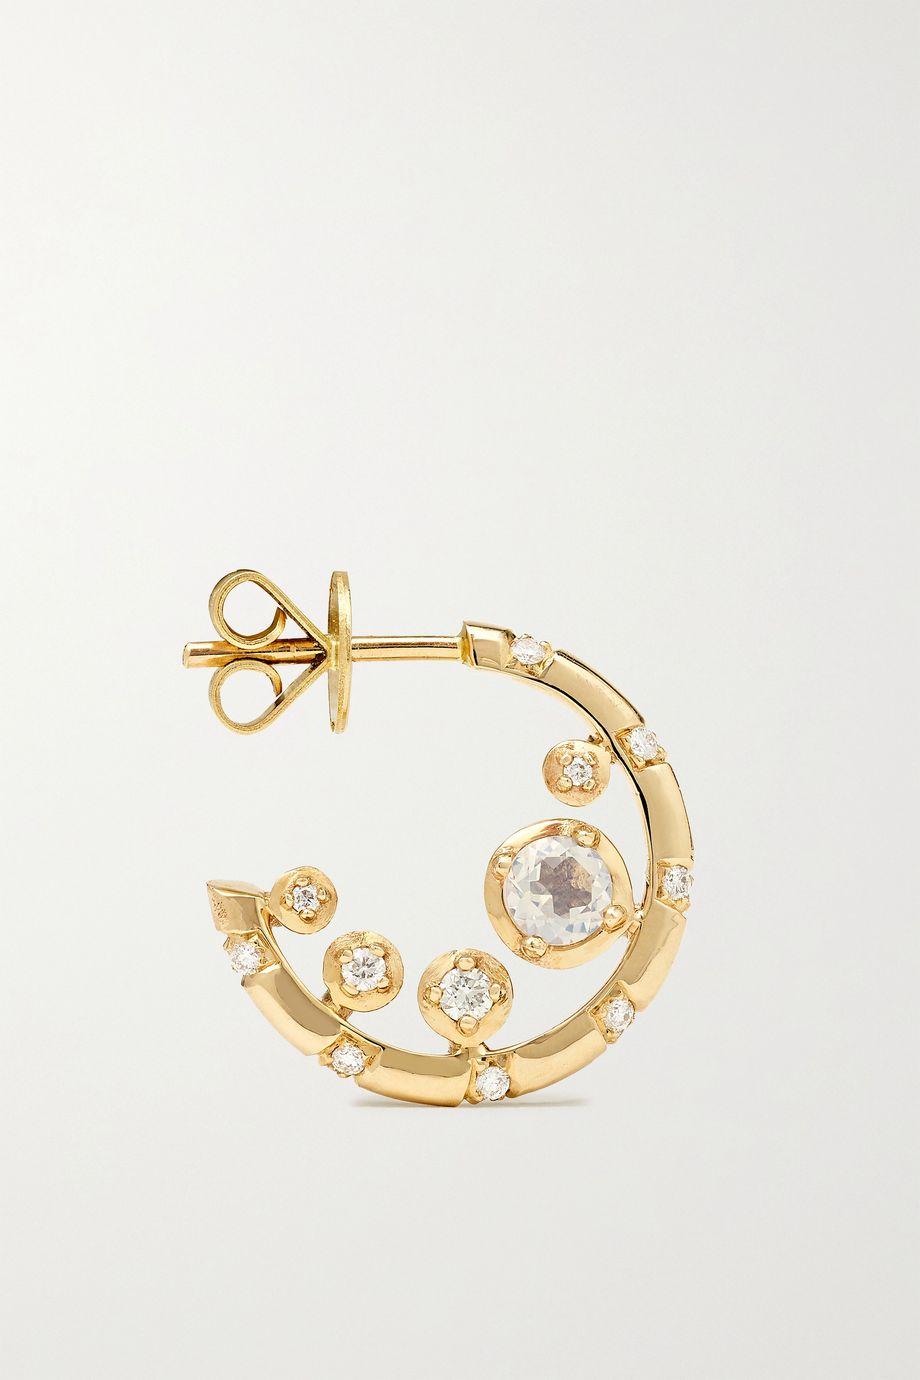 Alice Cicolini Bubble Kimono Nibble 14-karat gold, diamond and quartz earrings